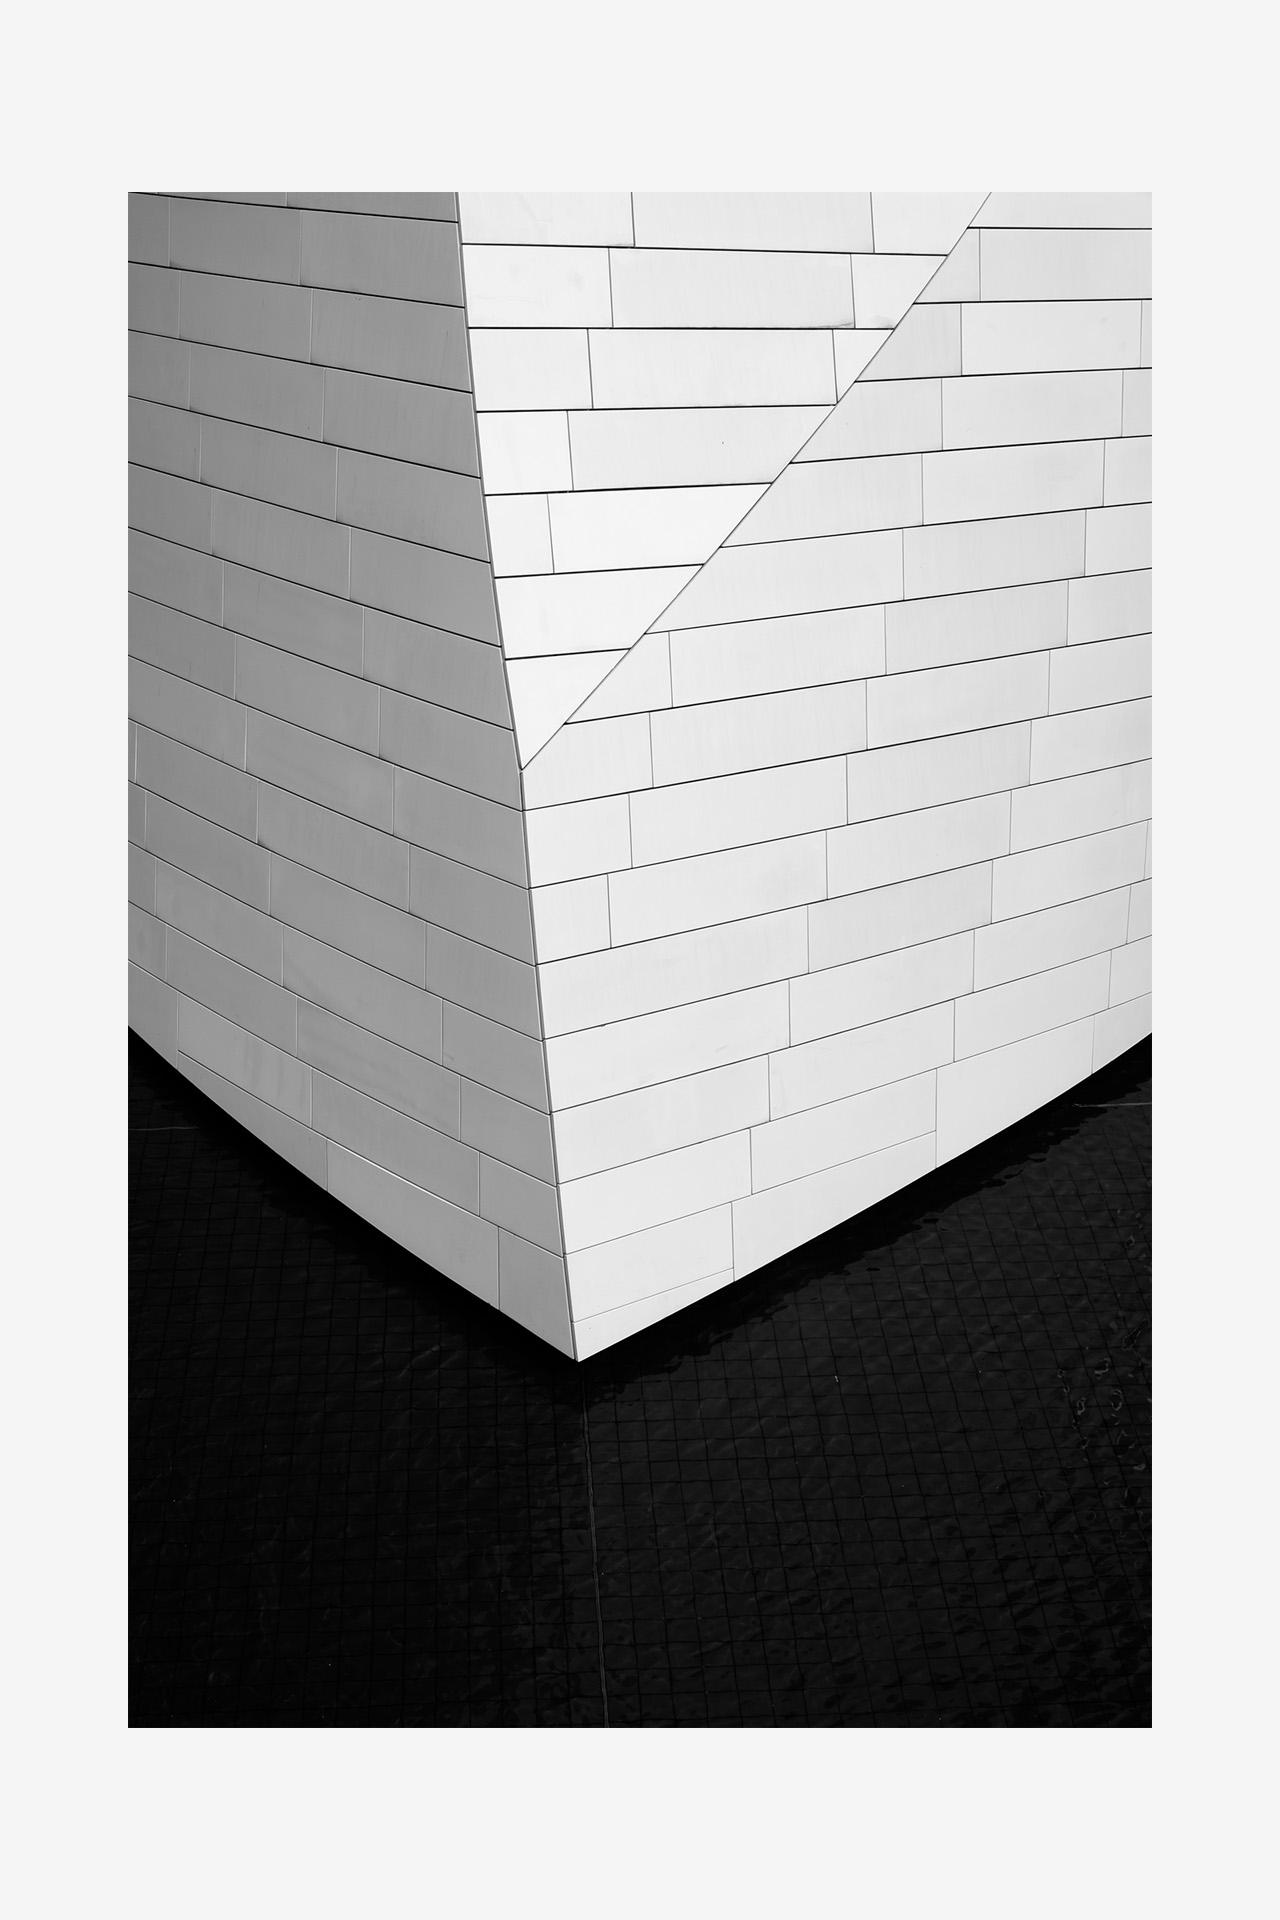 fondation-louis-vuitton-01B